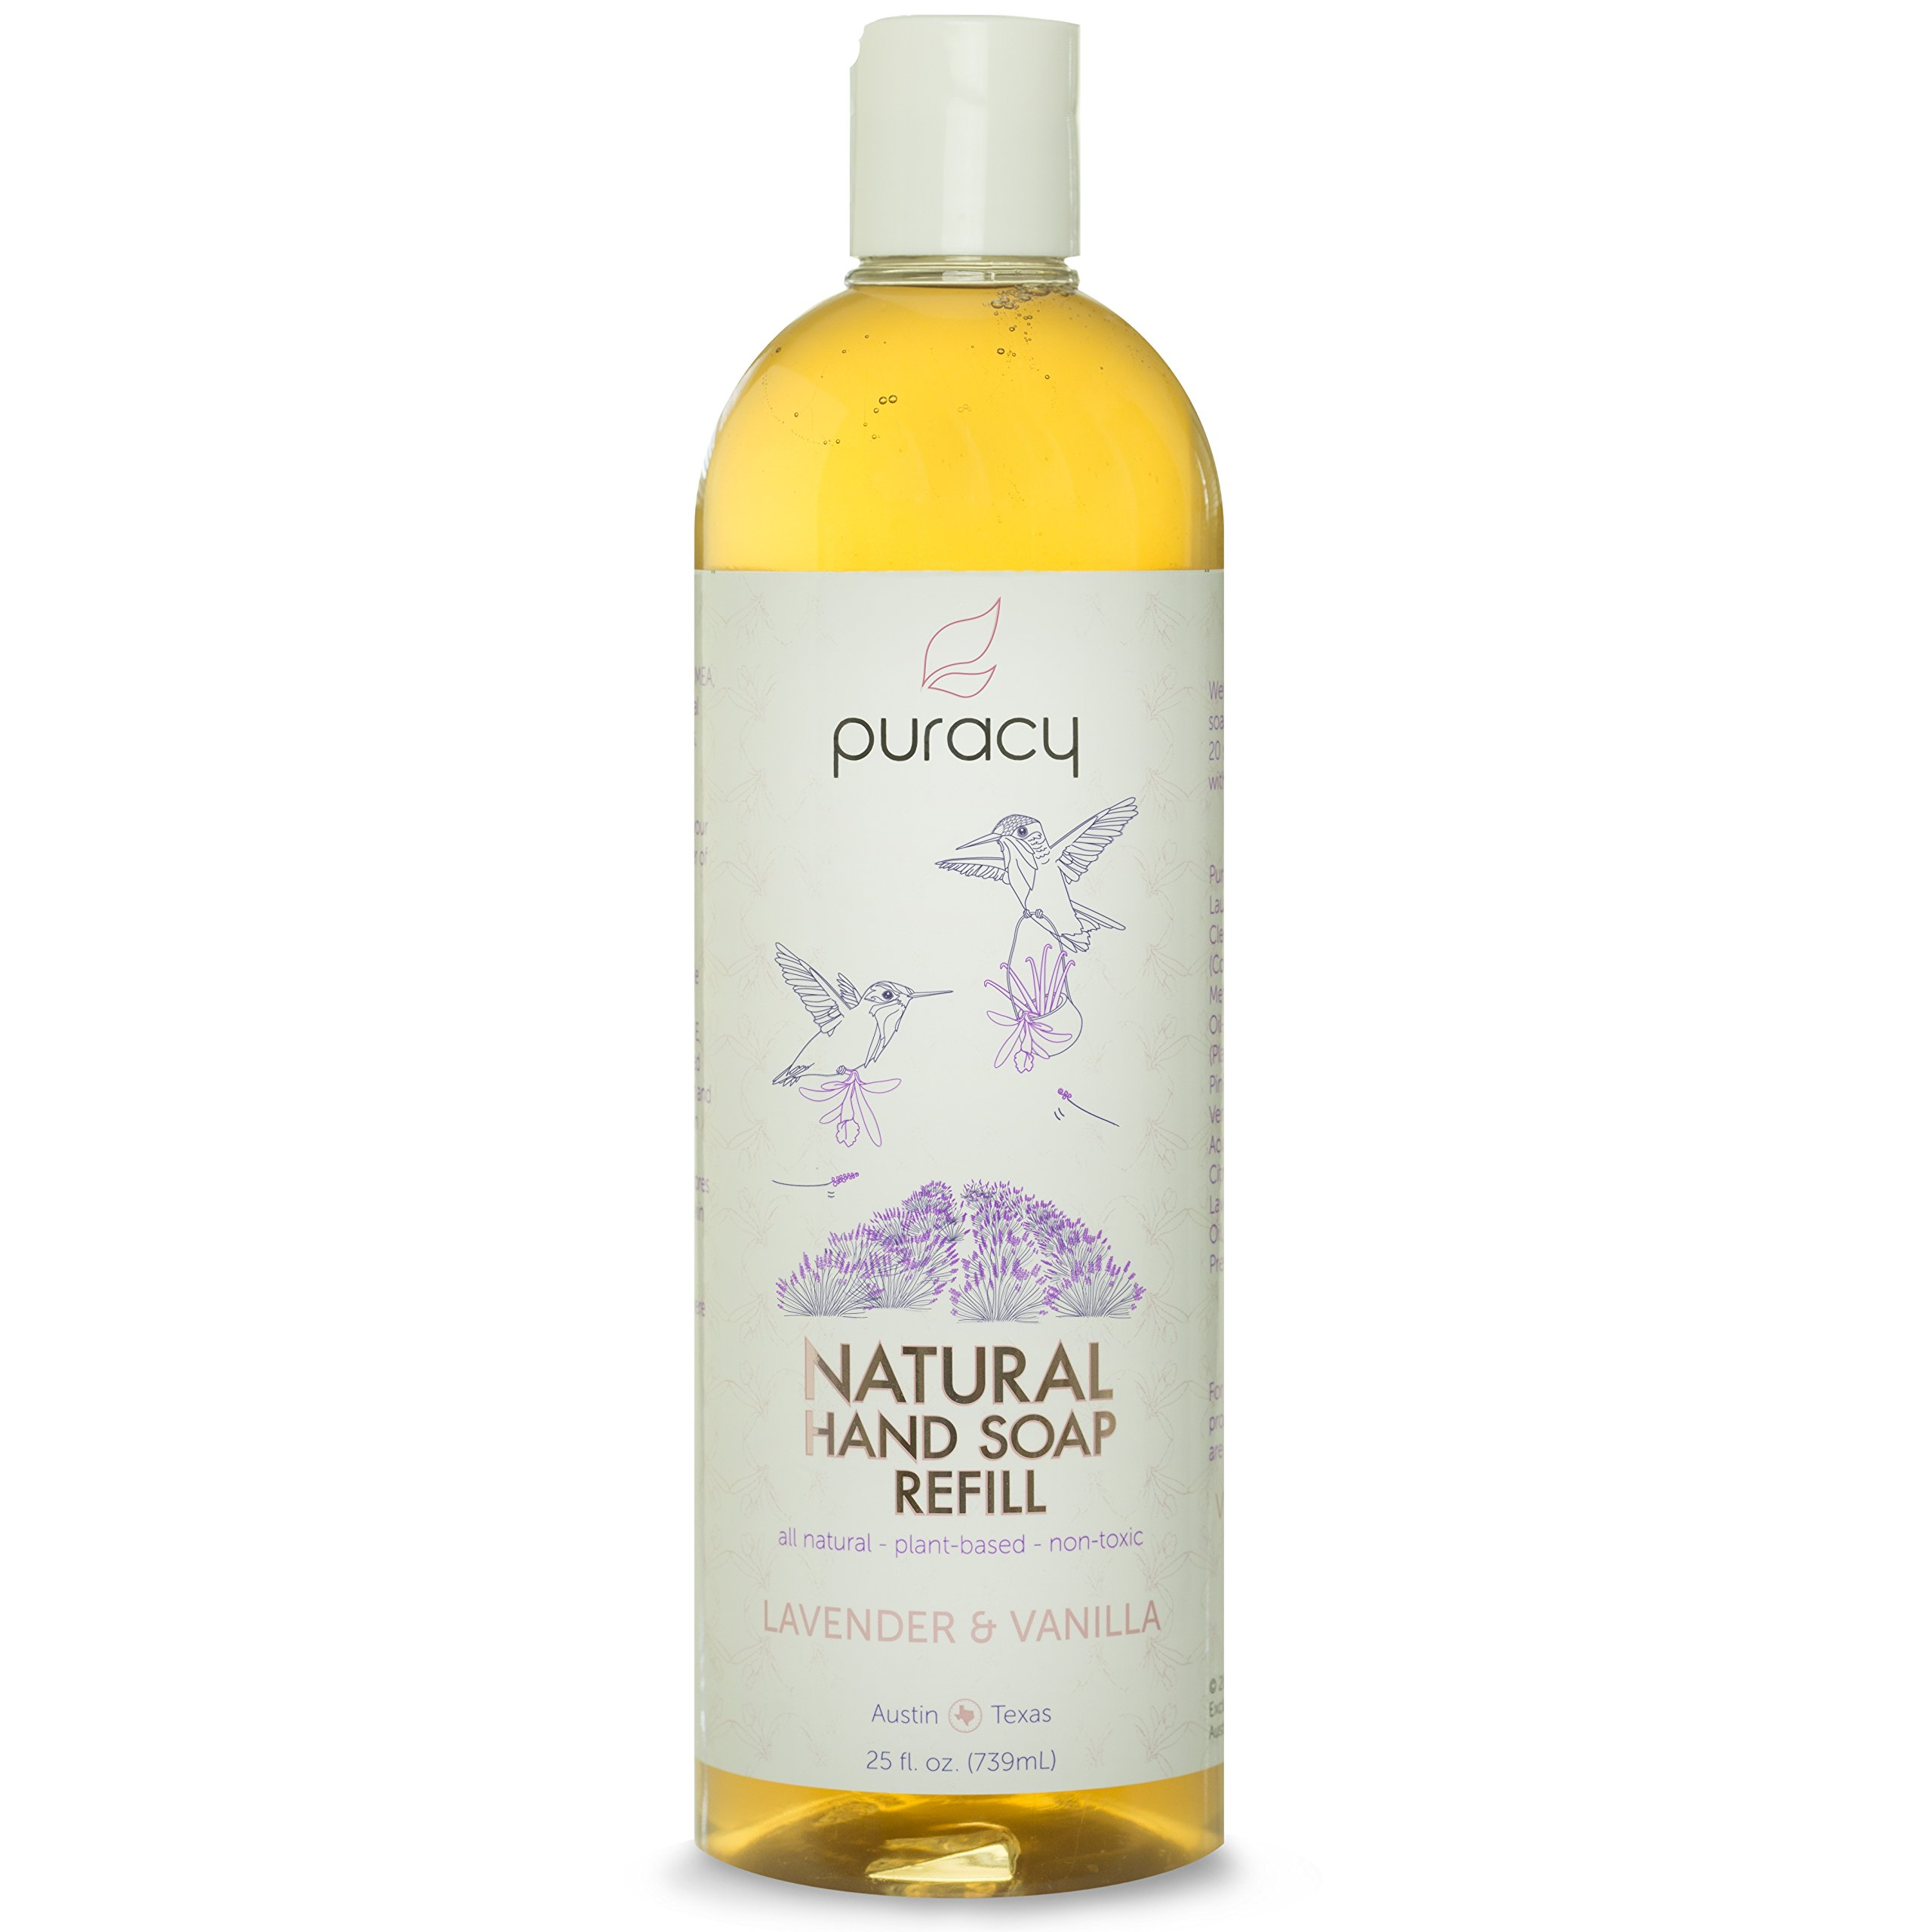 Puracy All Natural Liquid Hand Soap Refill Lavender